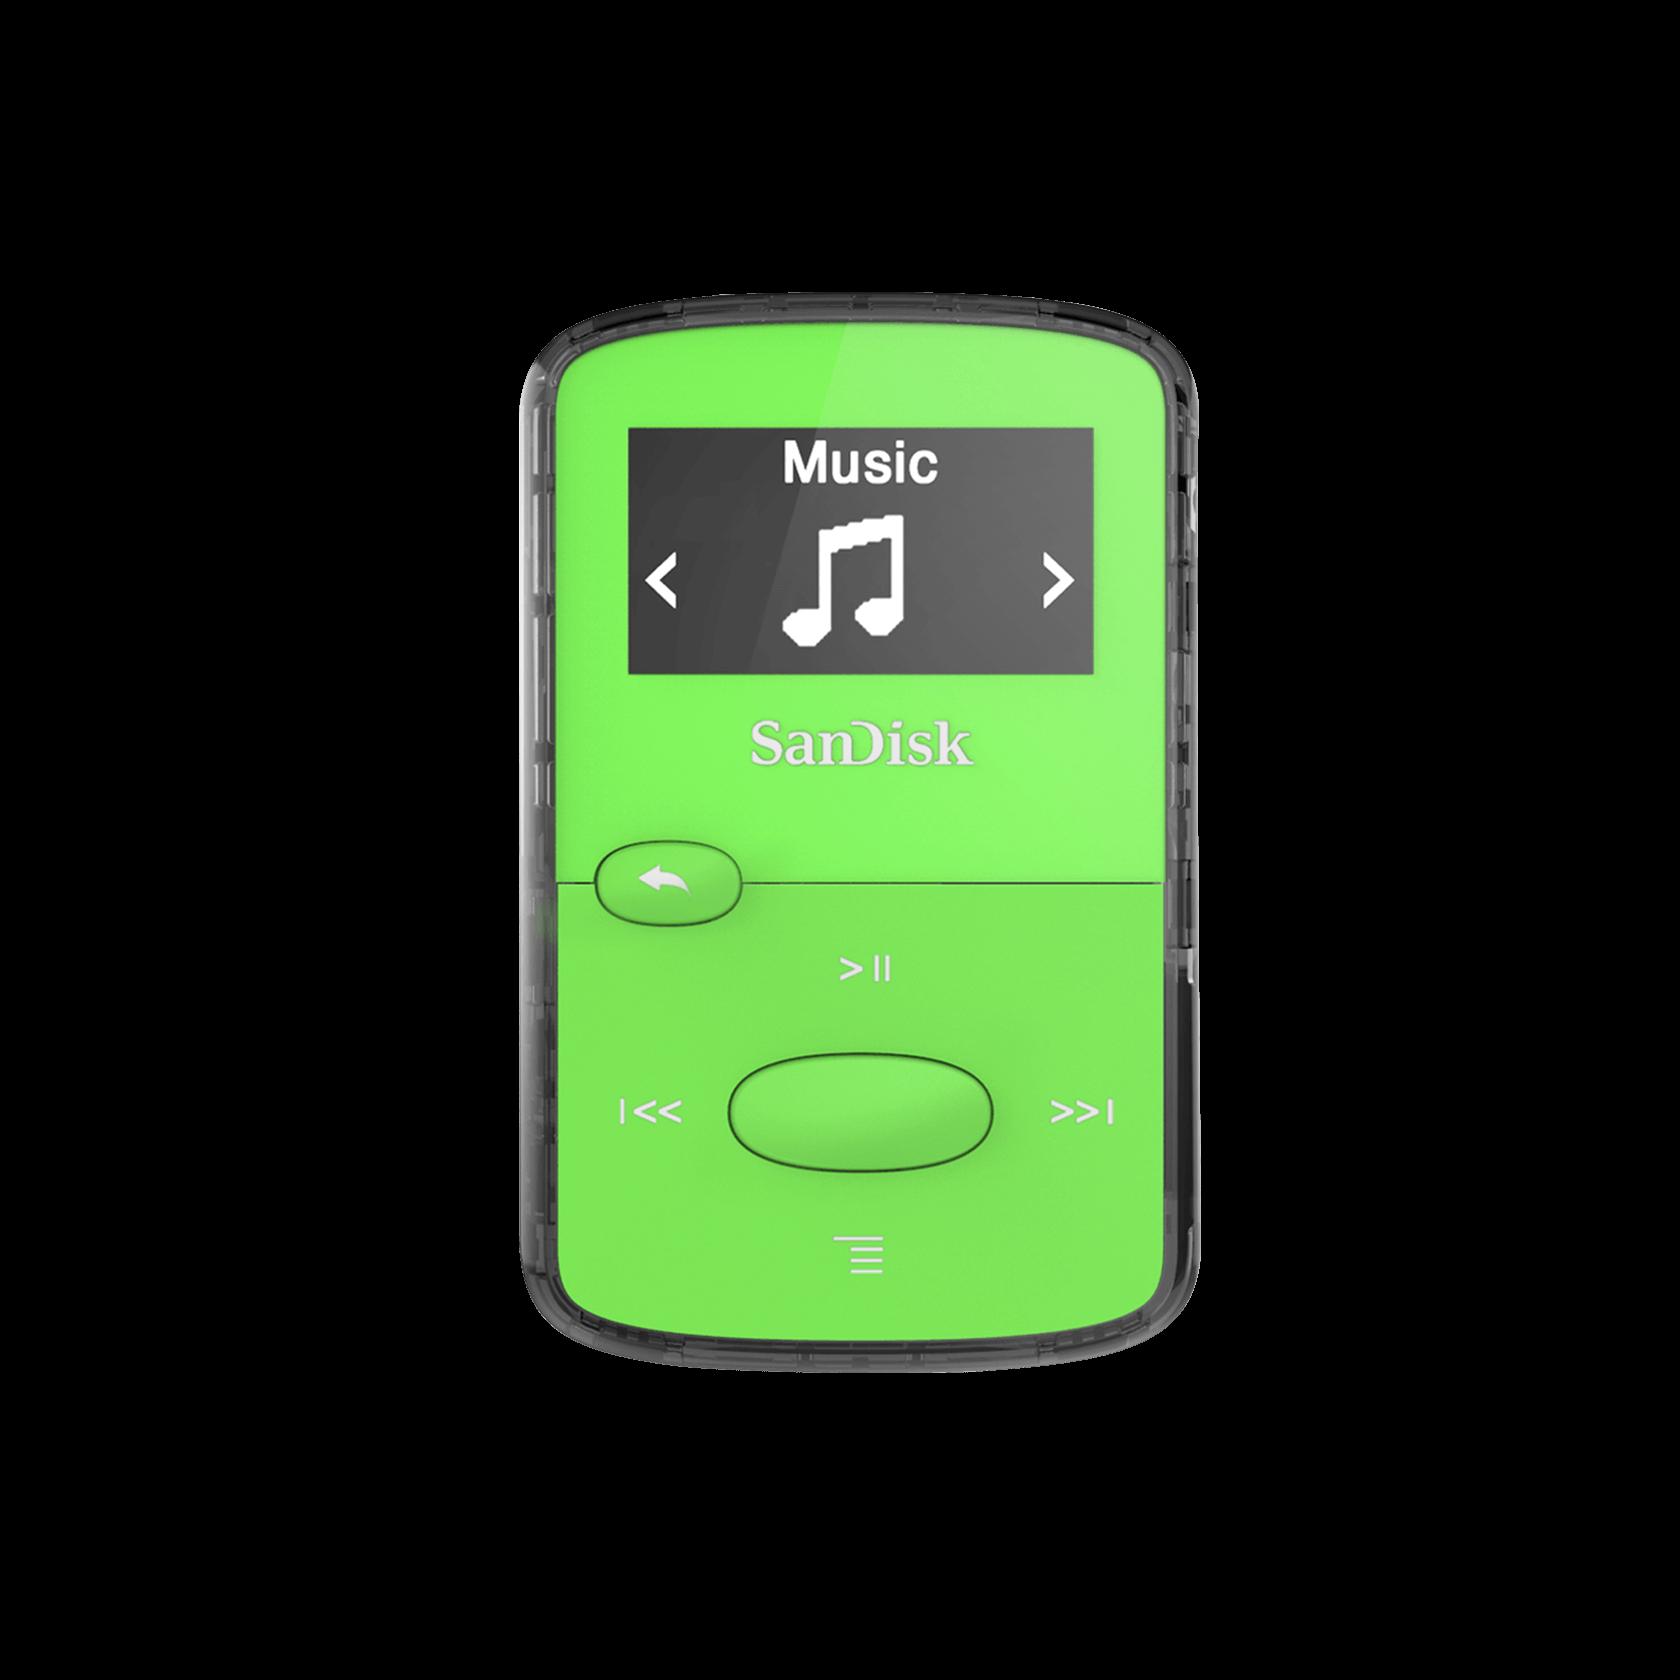 Battery Black Sandisk Sdmx26-008g-g46k 8 Gb Flash Mp3 Player Fm Tuner